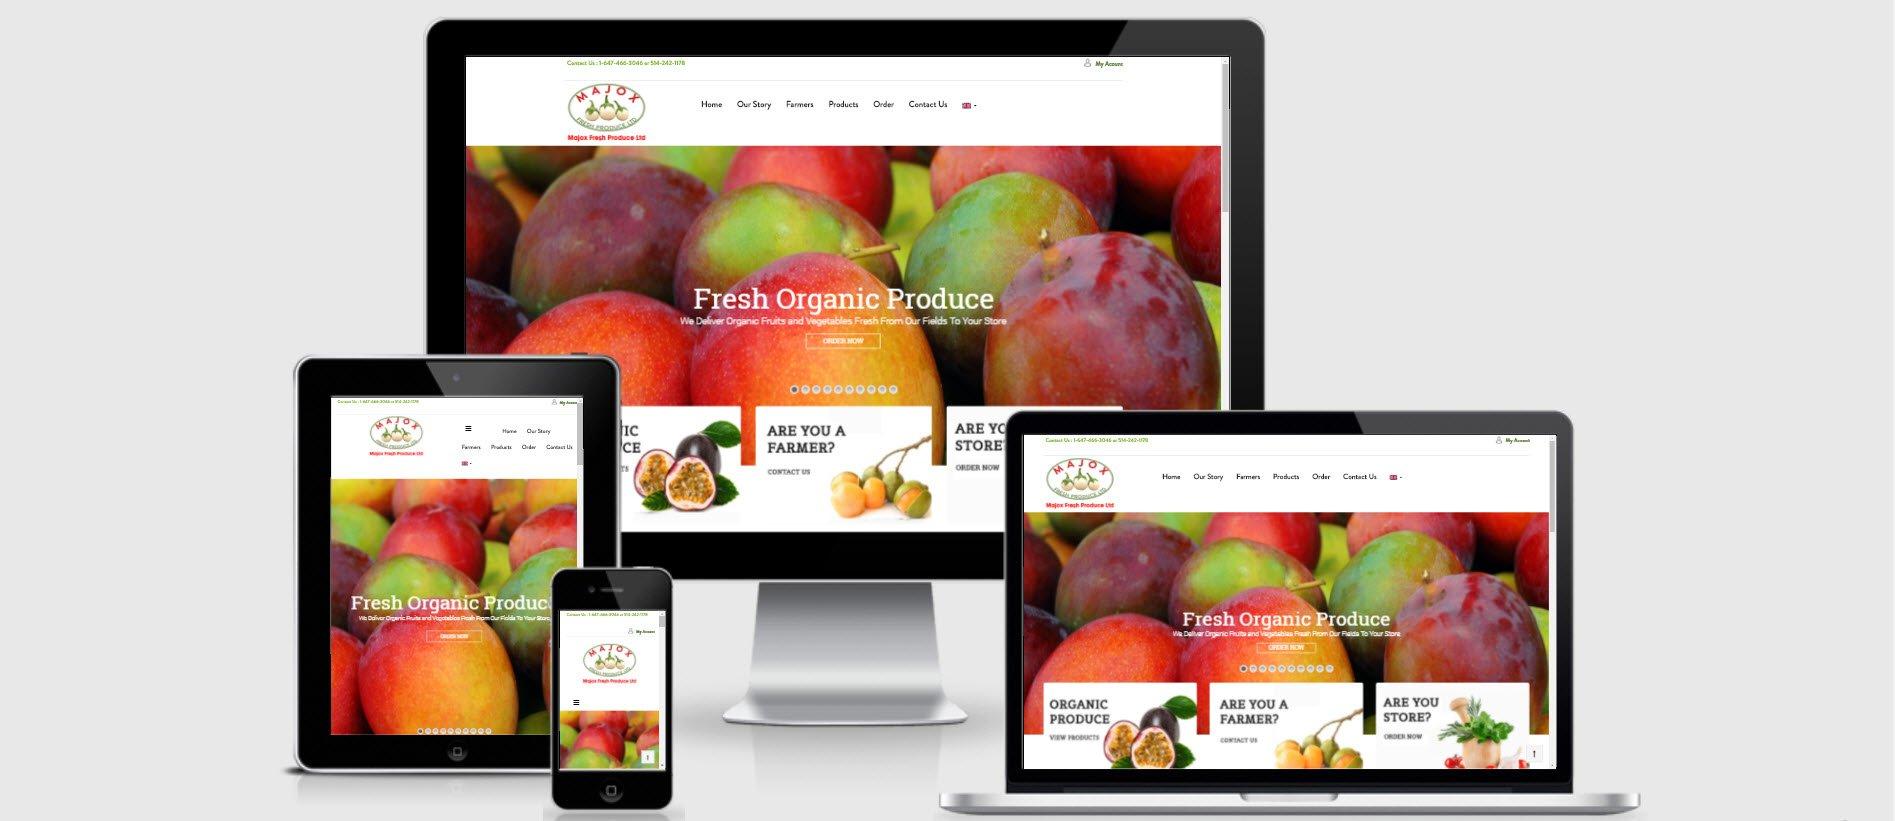 Majox Fresh Produce Ltd.